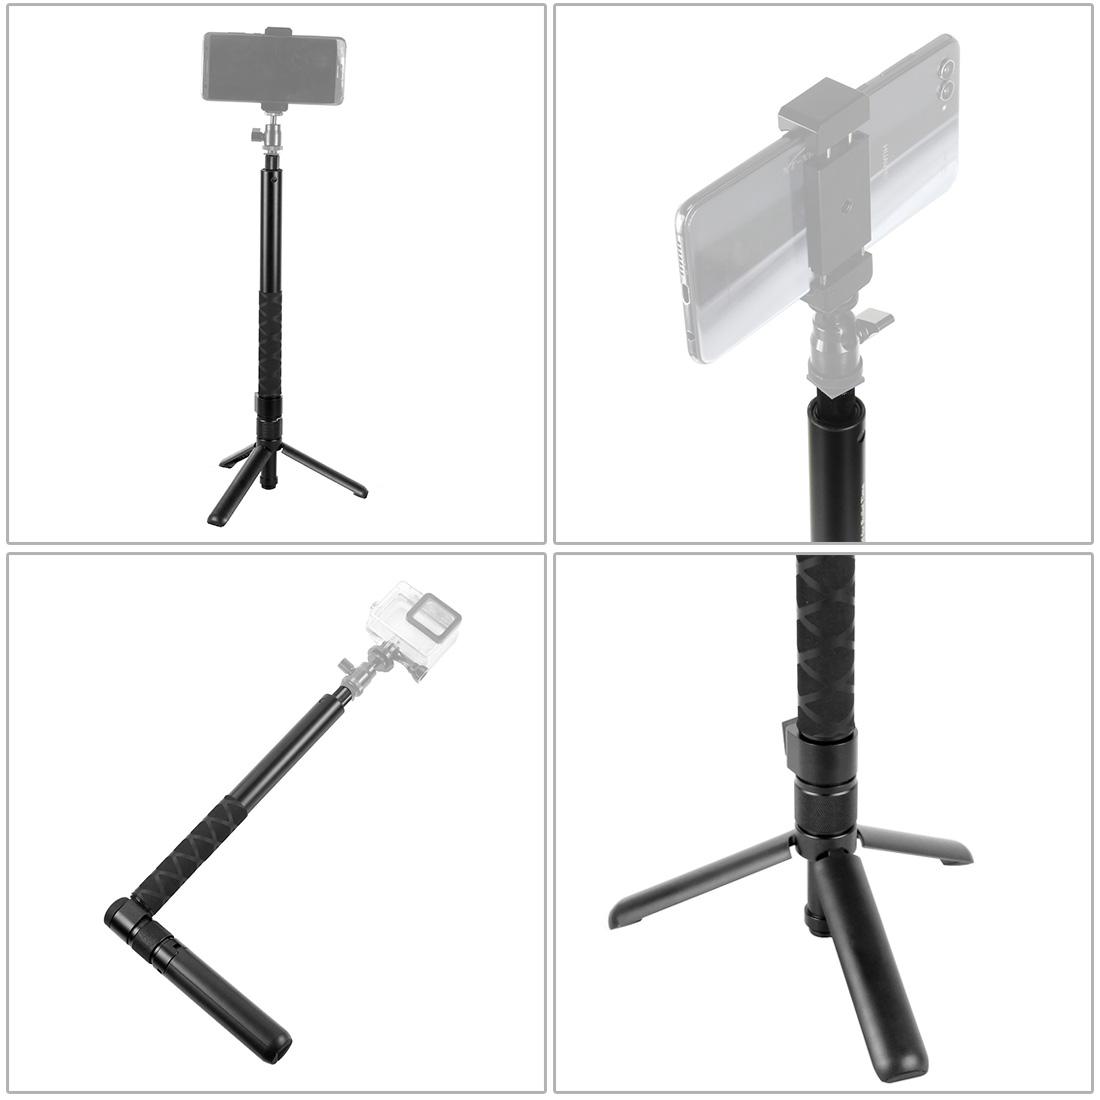 Insta360 ONE X Xiaomi Yi 4K XT-XINTE Extendable Pole Selfie Stick for Hero 7 EKEN SJCAM Handheld Monopod